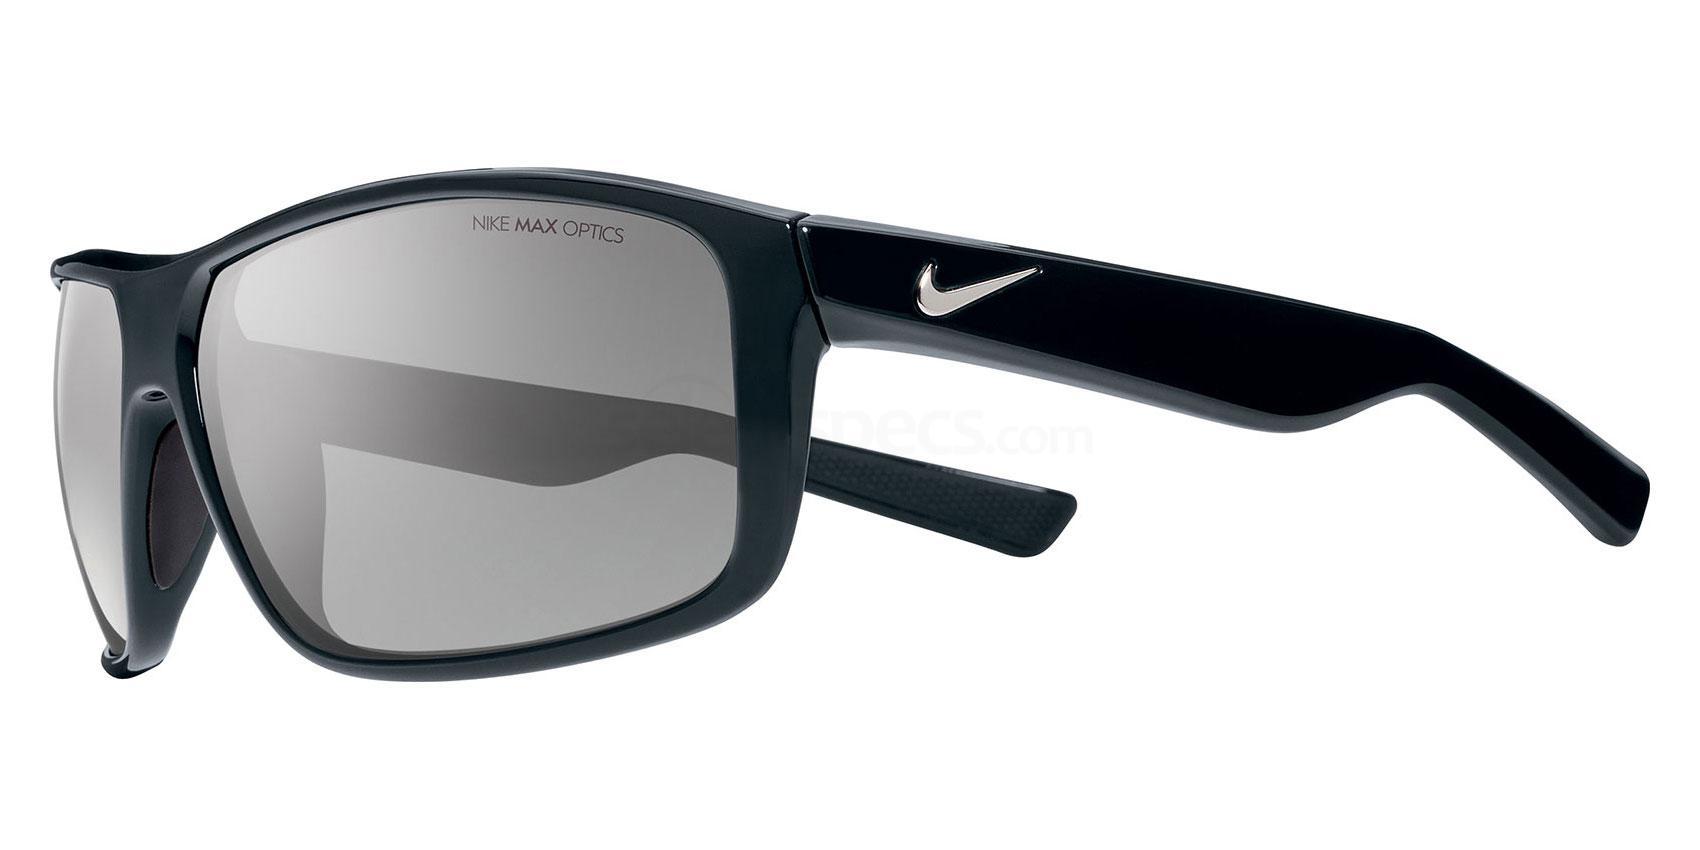 009 NIKE PREMIER 8.0 EV0792 Sunglasses, Nike